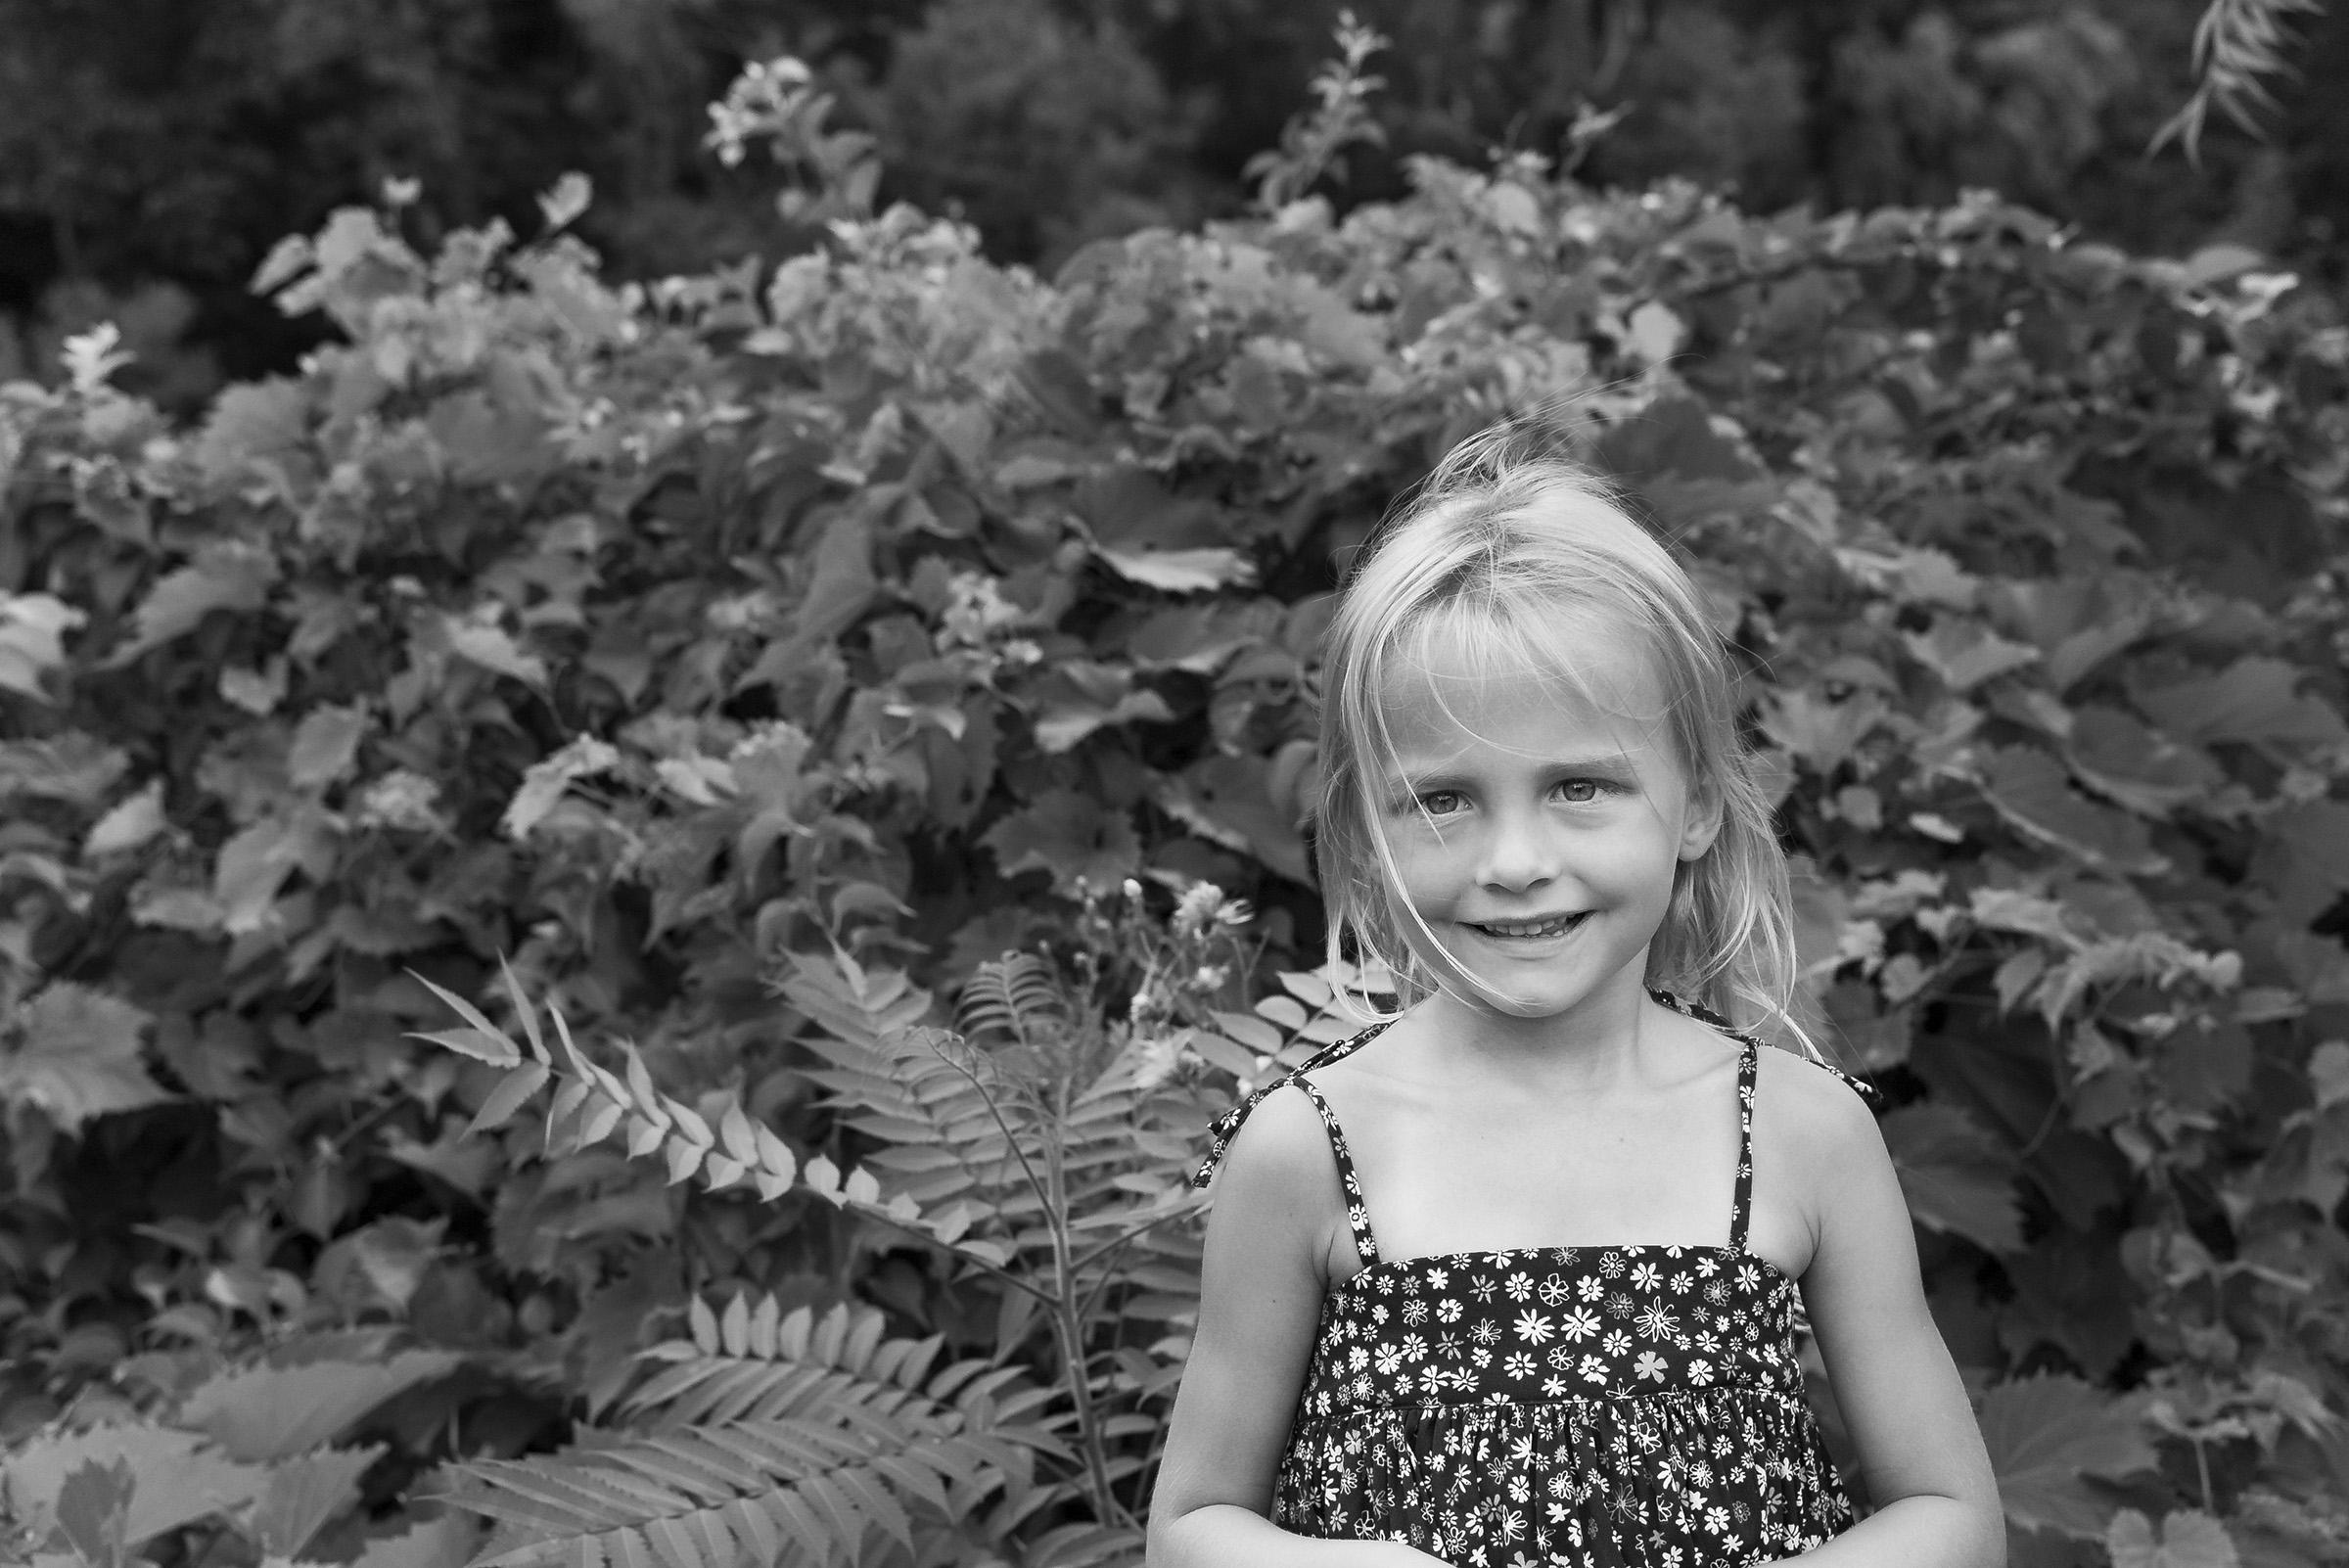 malatesta_family_portrait_072817_0470.jpg